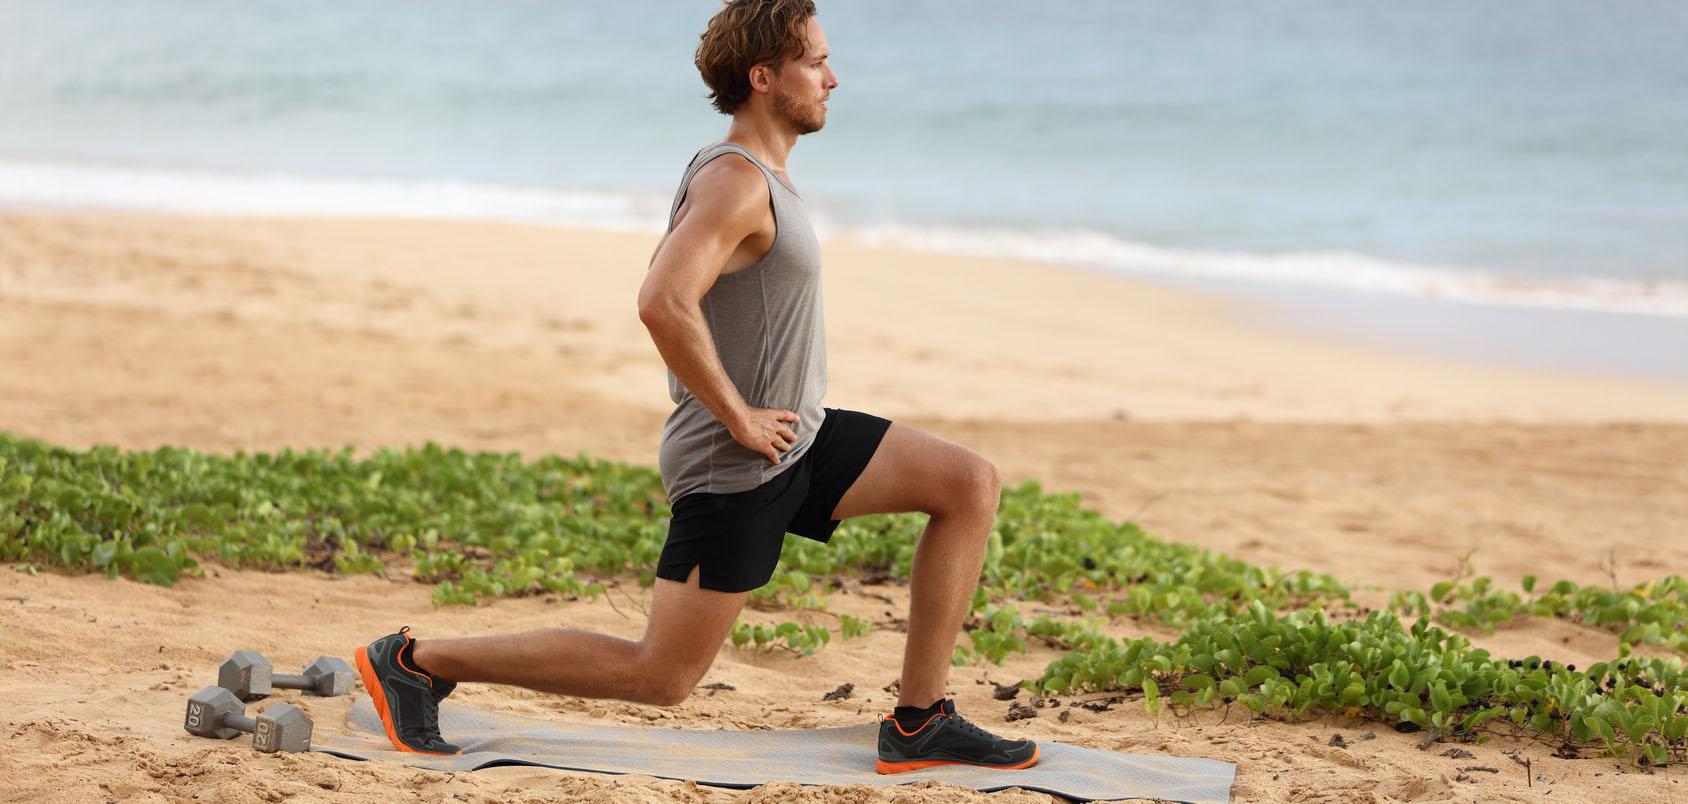 junger sportlicher Mann am Strand macht Oberschenkeltraining mit Ausfallschritt